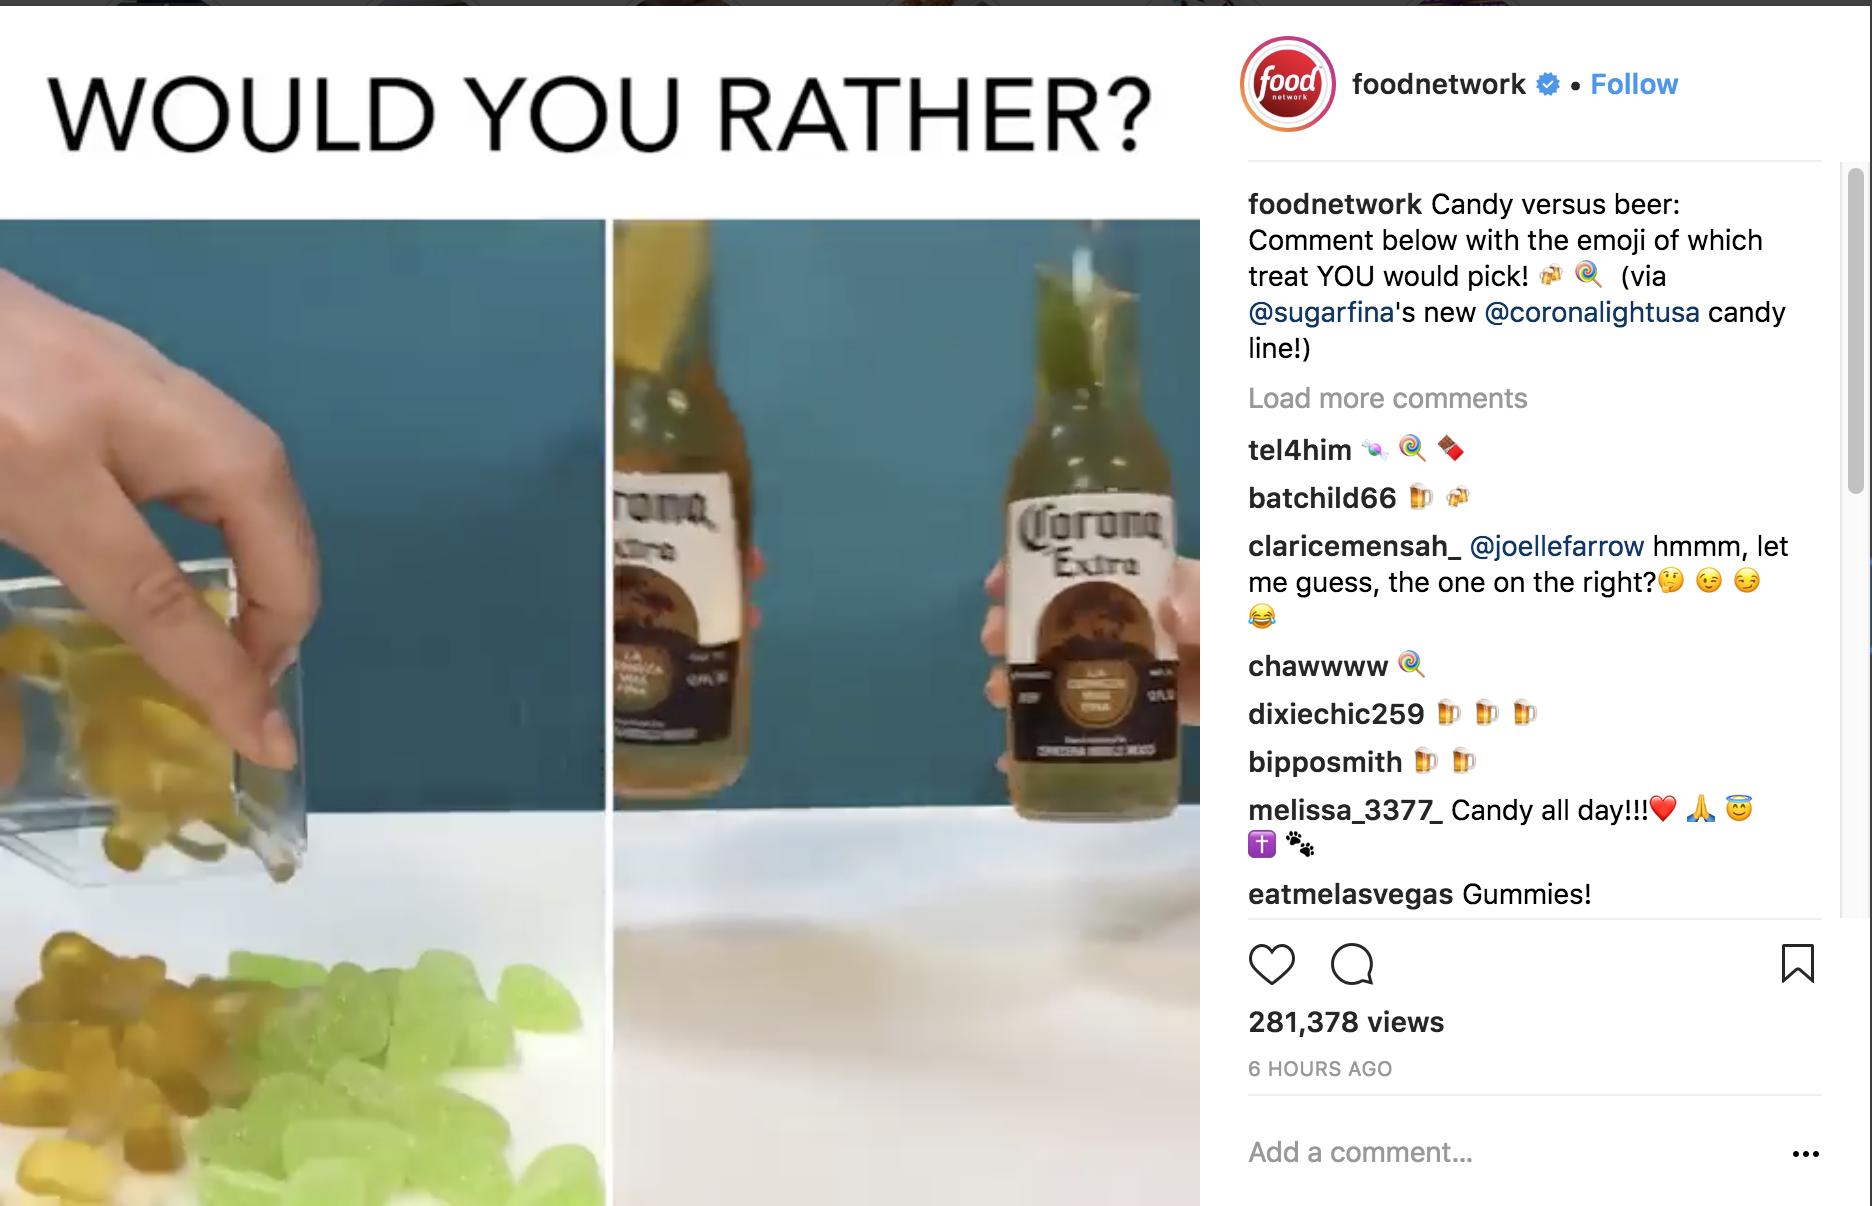 food-network-instagram-marketing-strategy